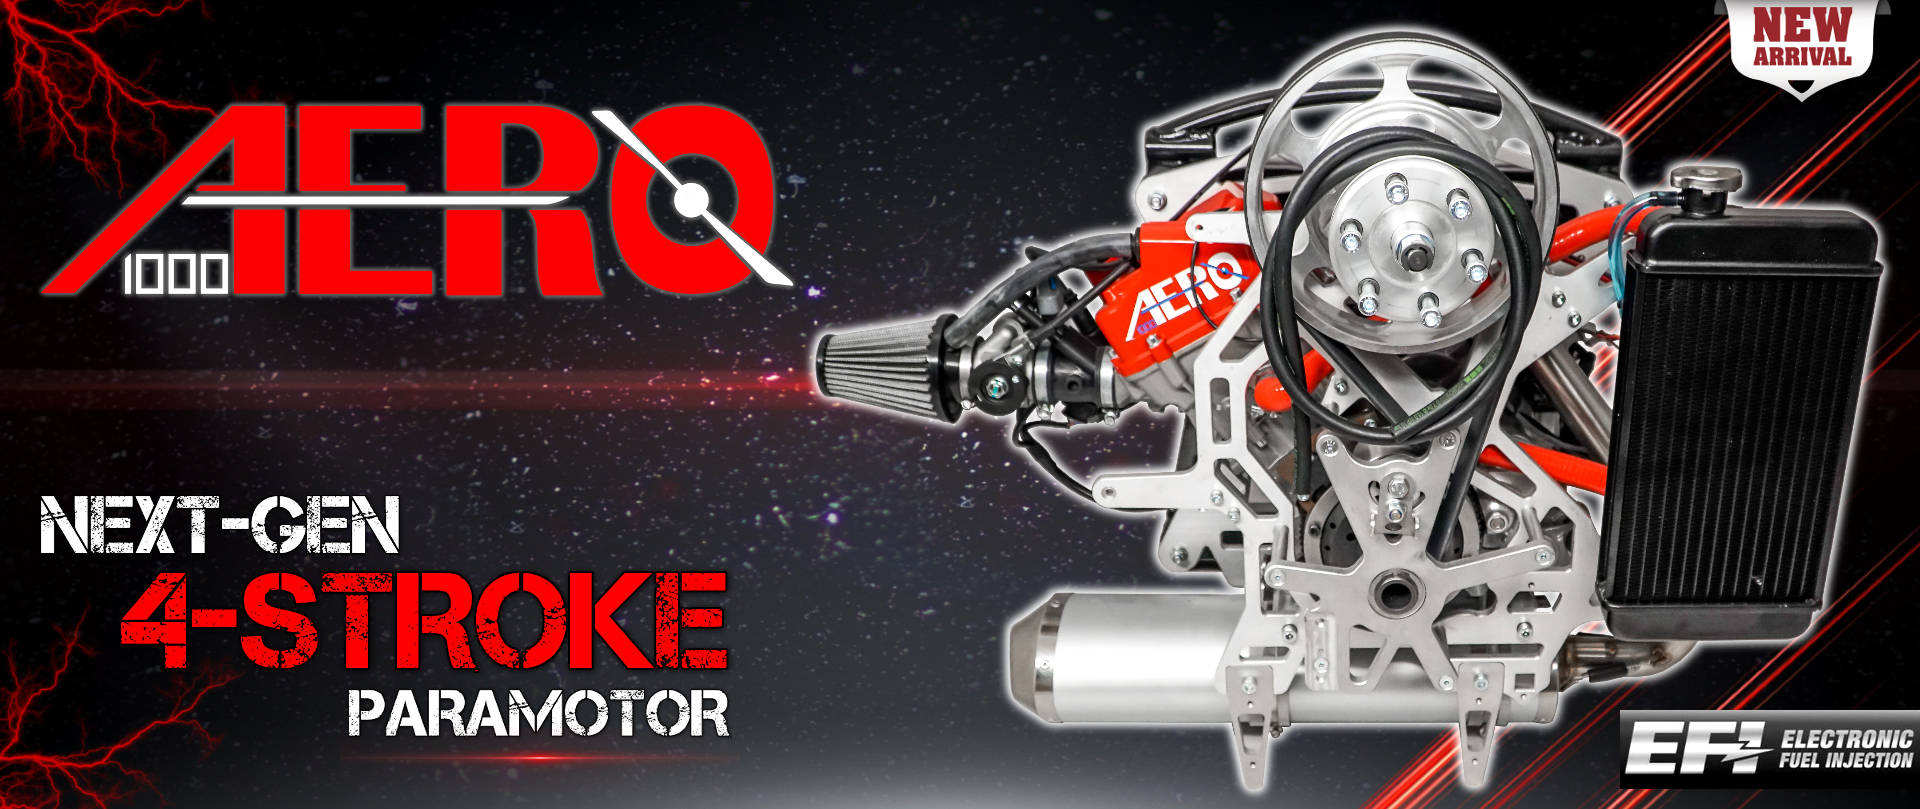 Aero 1000 4-Stroke Paramotor From BlackHawk